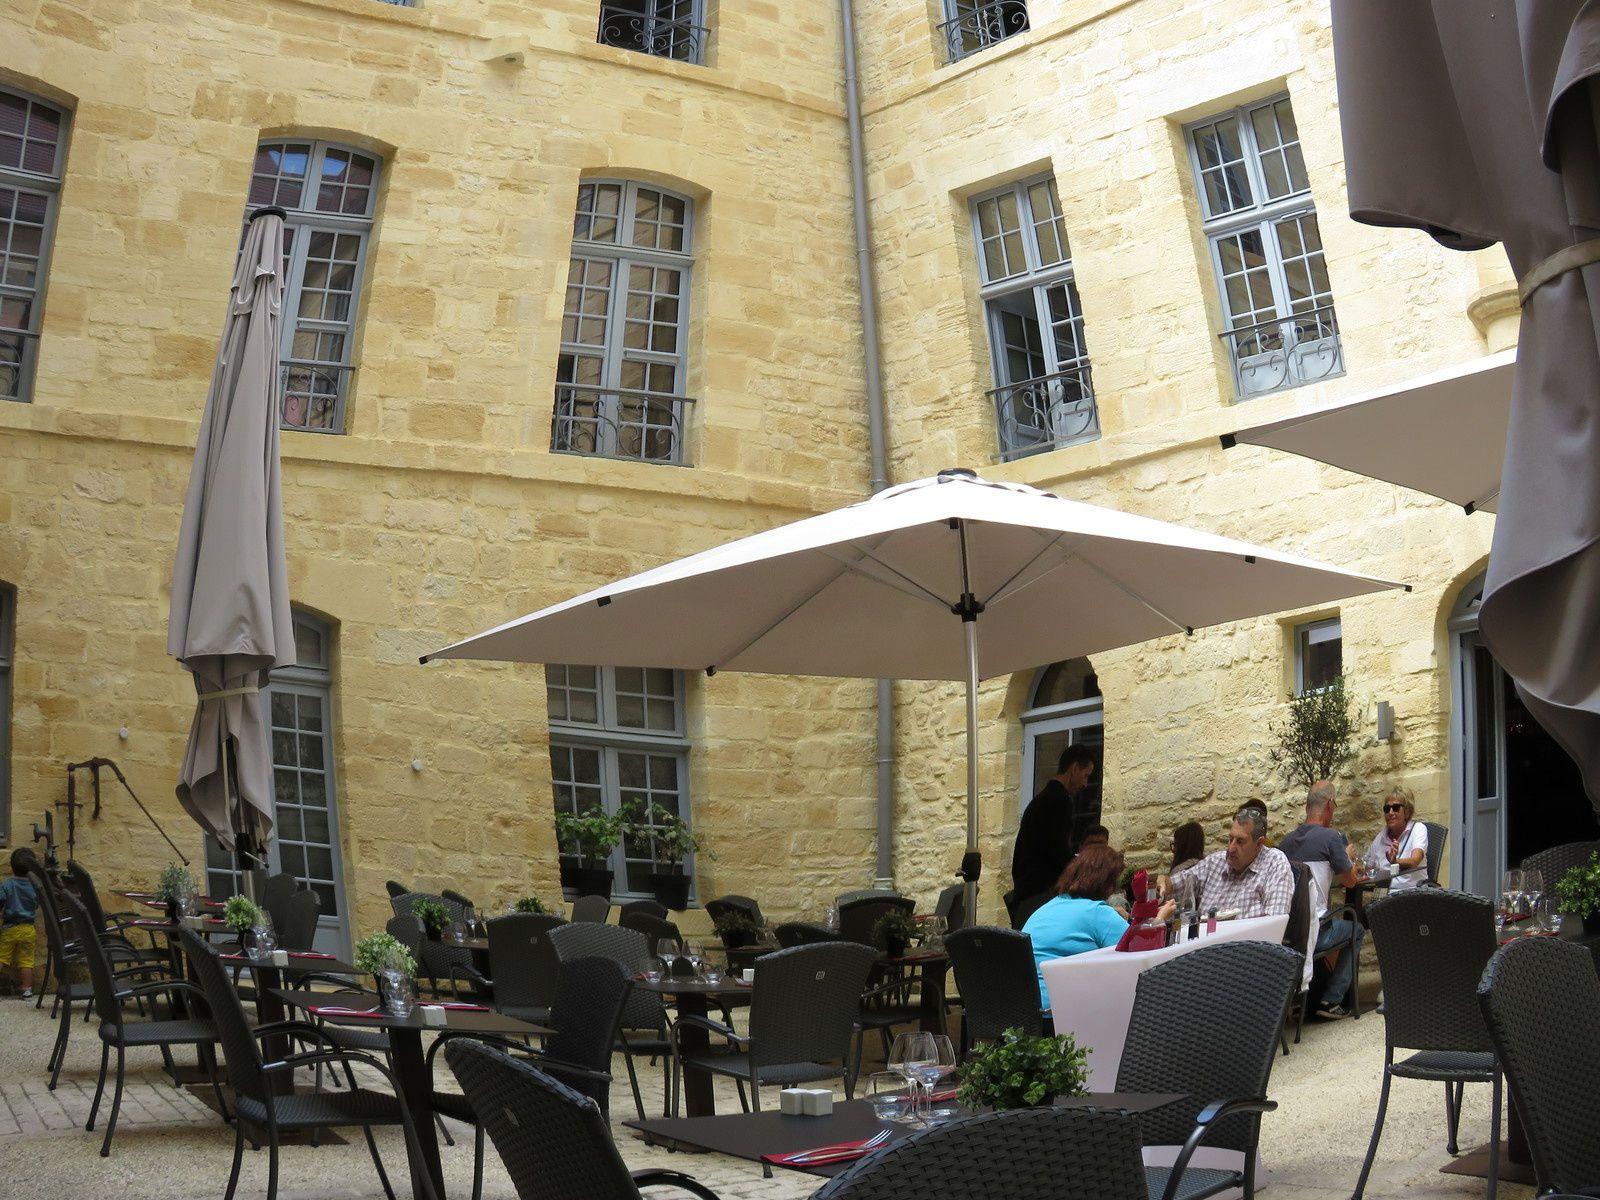 HOTEL DIEU / RESTAURANT A SARLAT / BISTRONOMIE